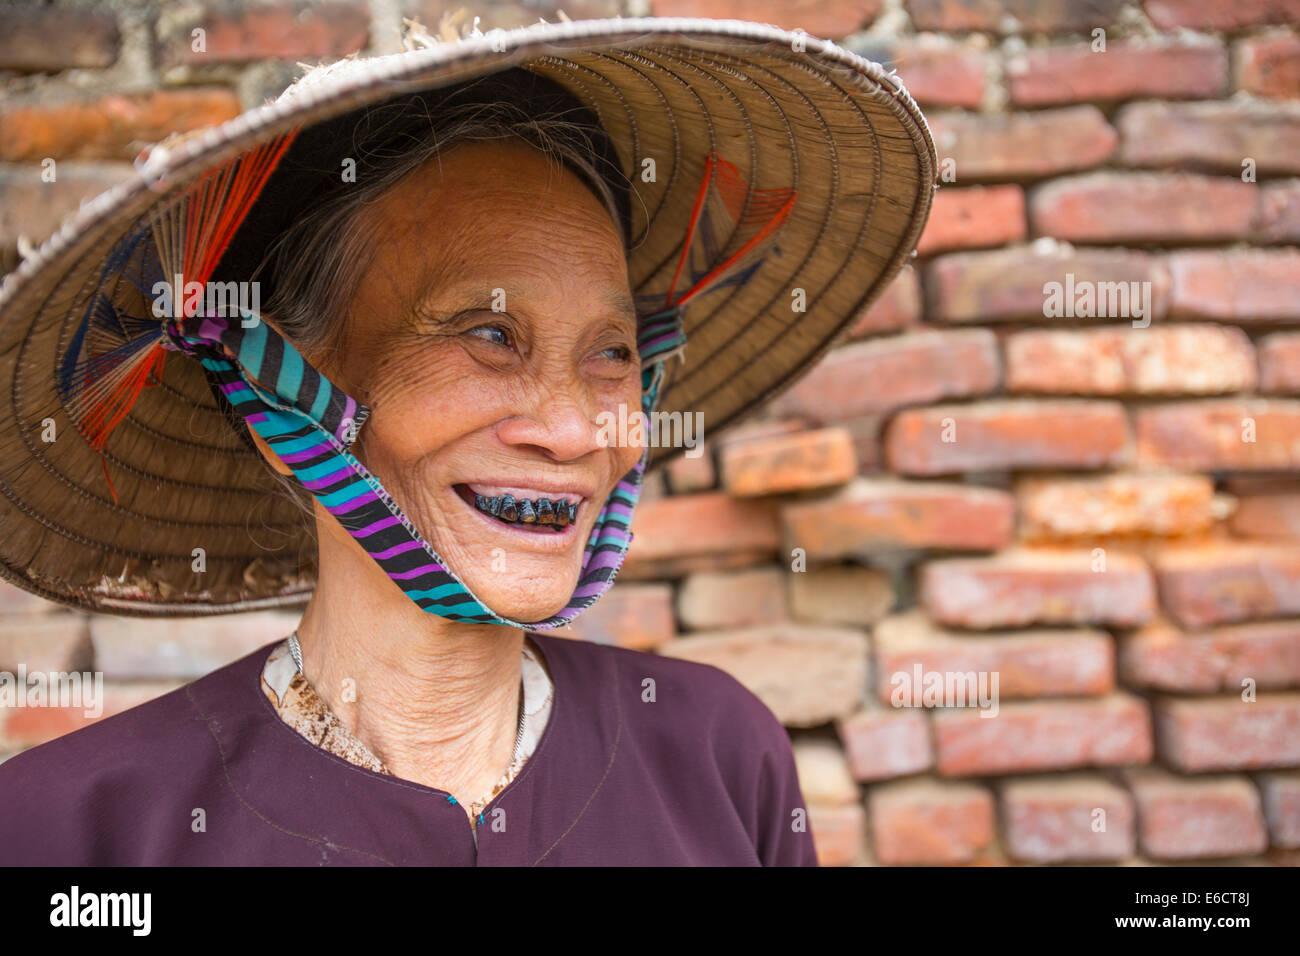 nha sĩ - ý kiến mấy bác ra sao nha? .. - Page 2 Vietnamese-woman-with-black-teeth-from-chewing-betel-nuts-in-hanoi-E6CT8J